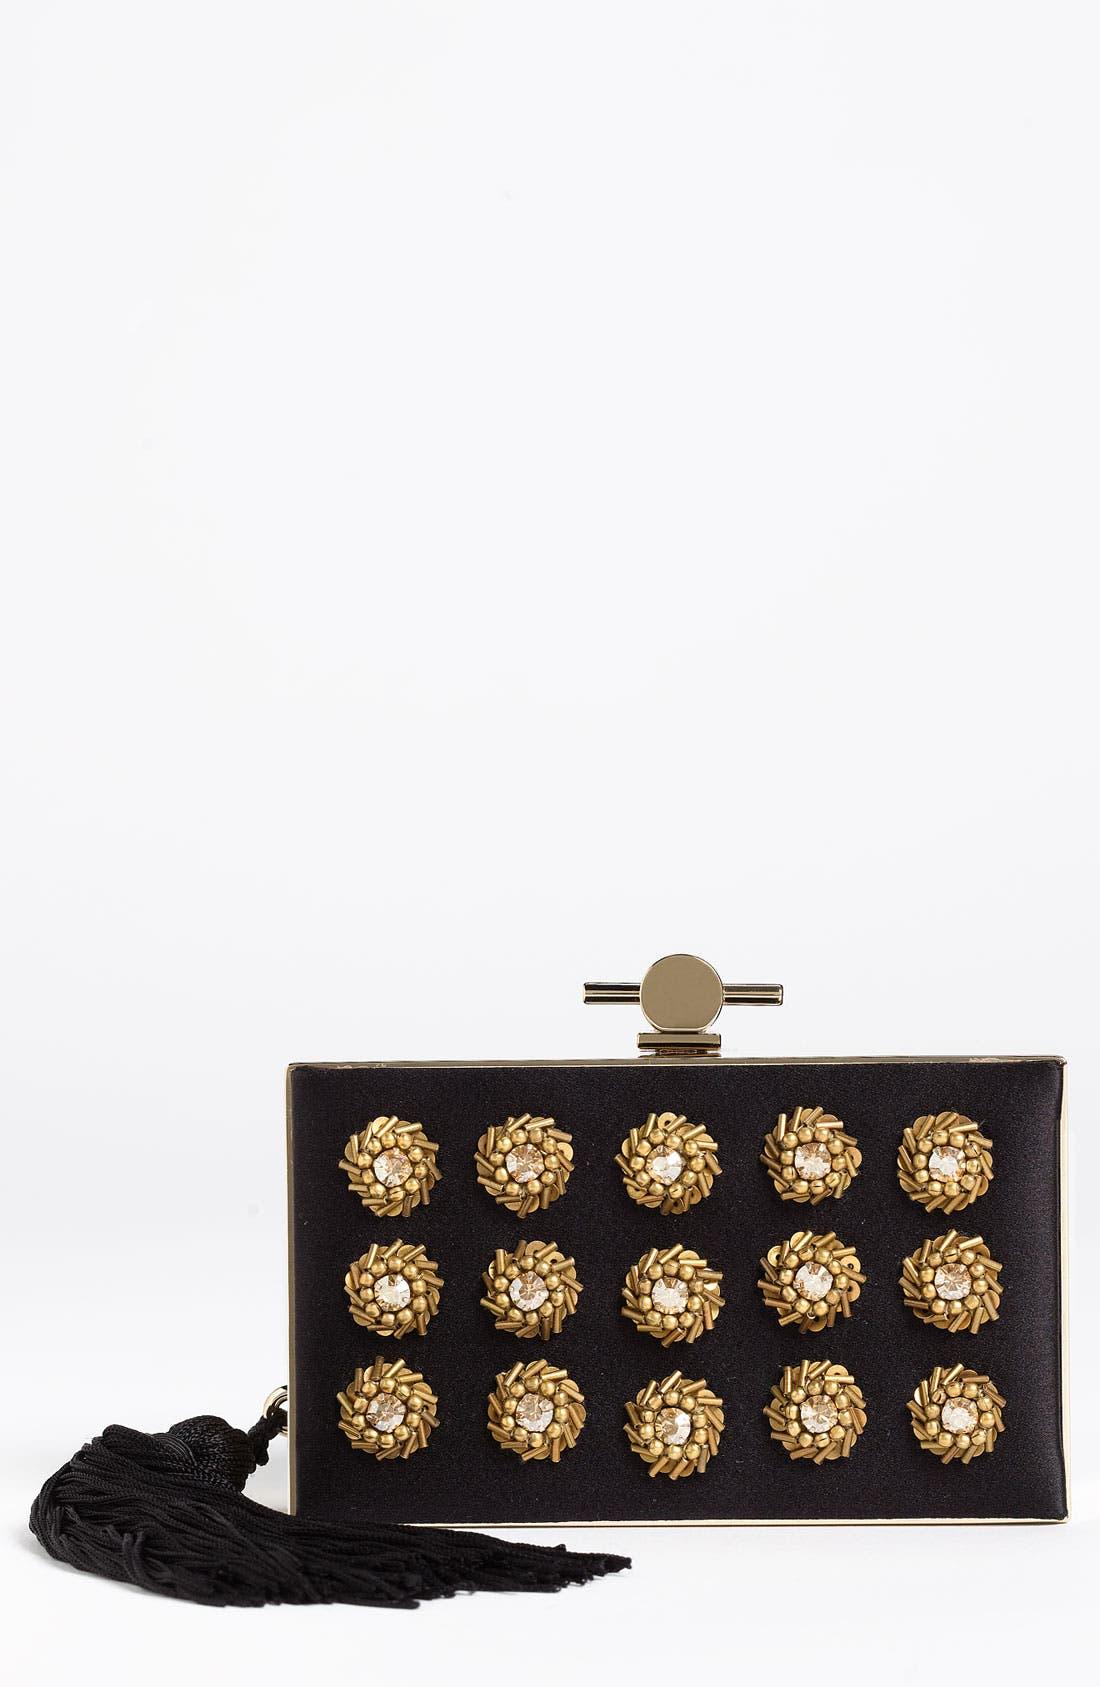 Alternate Image 1 Selected - Jason Wu 'Daphne' Box Clutch